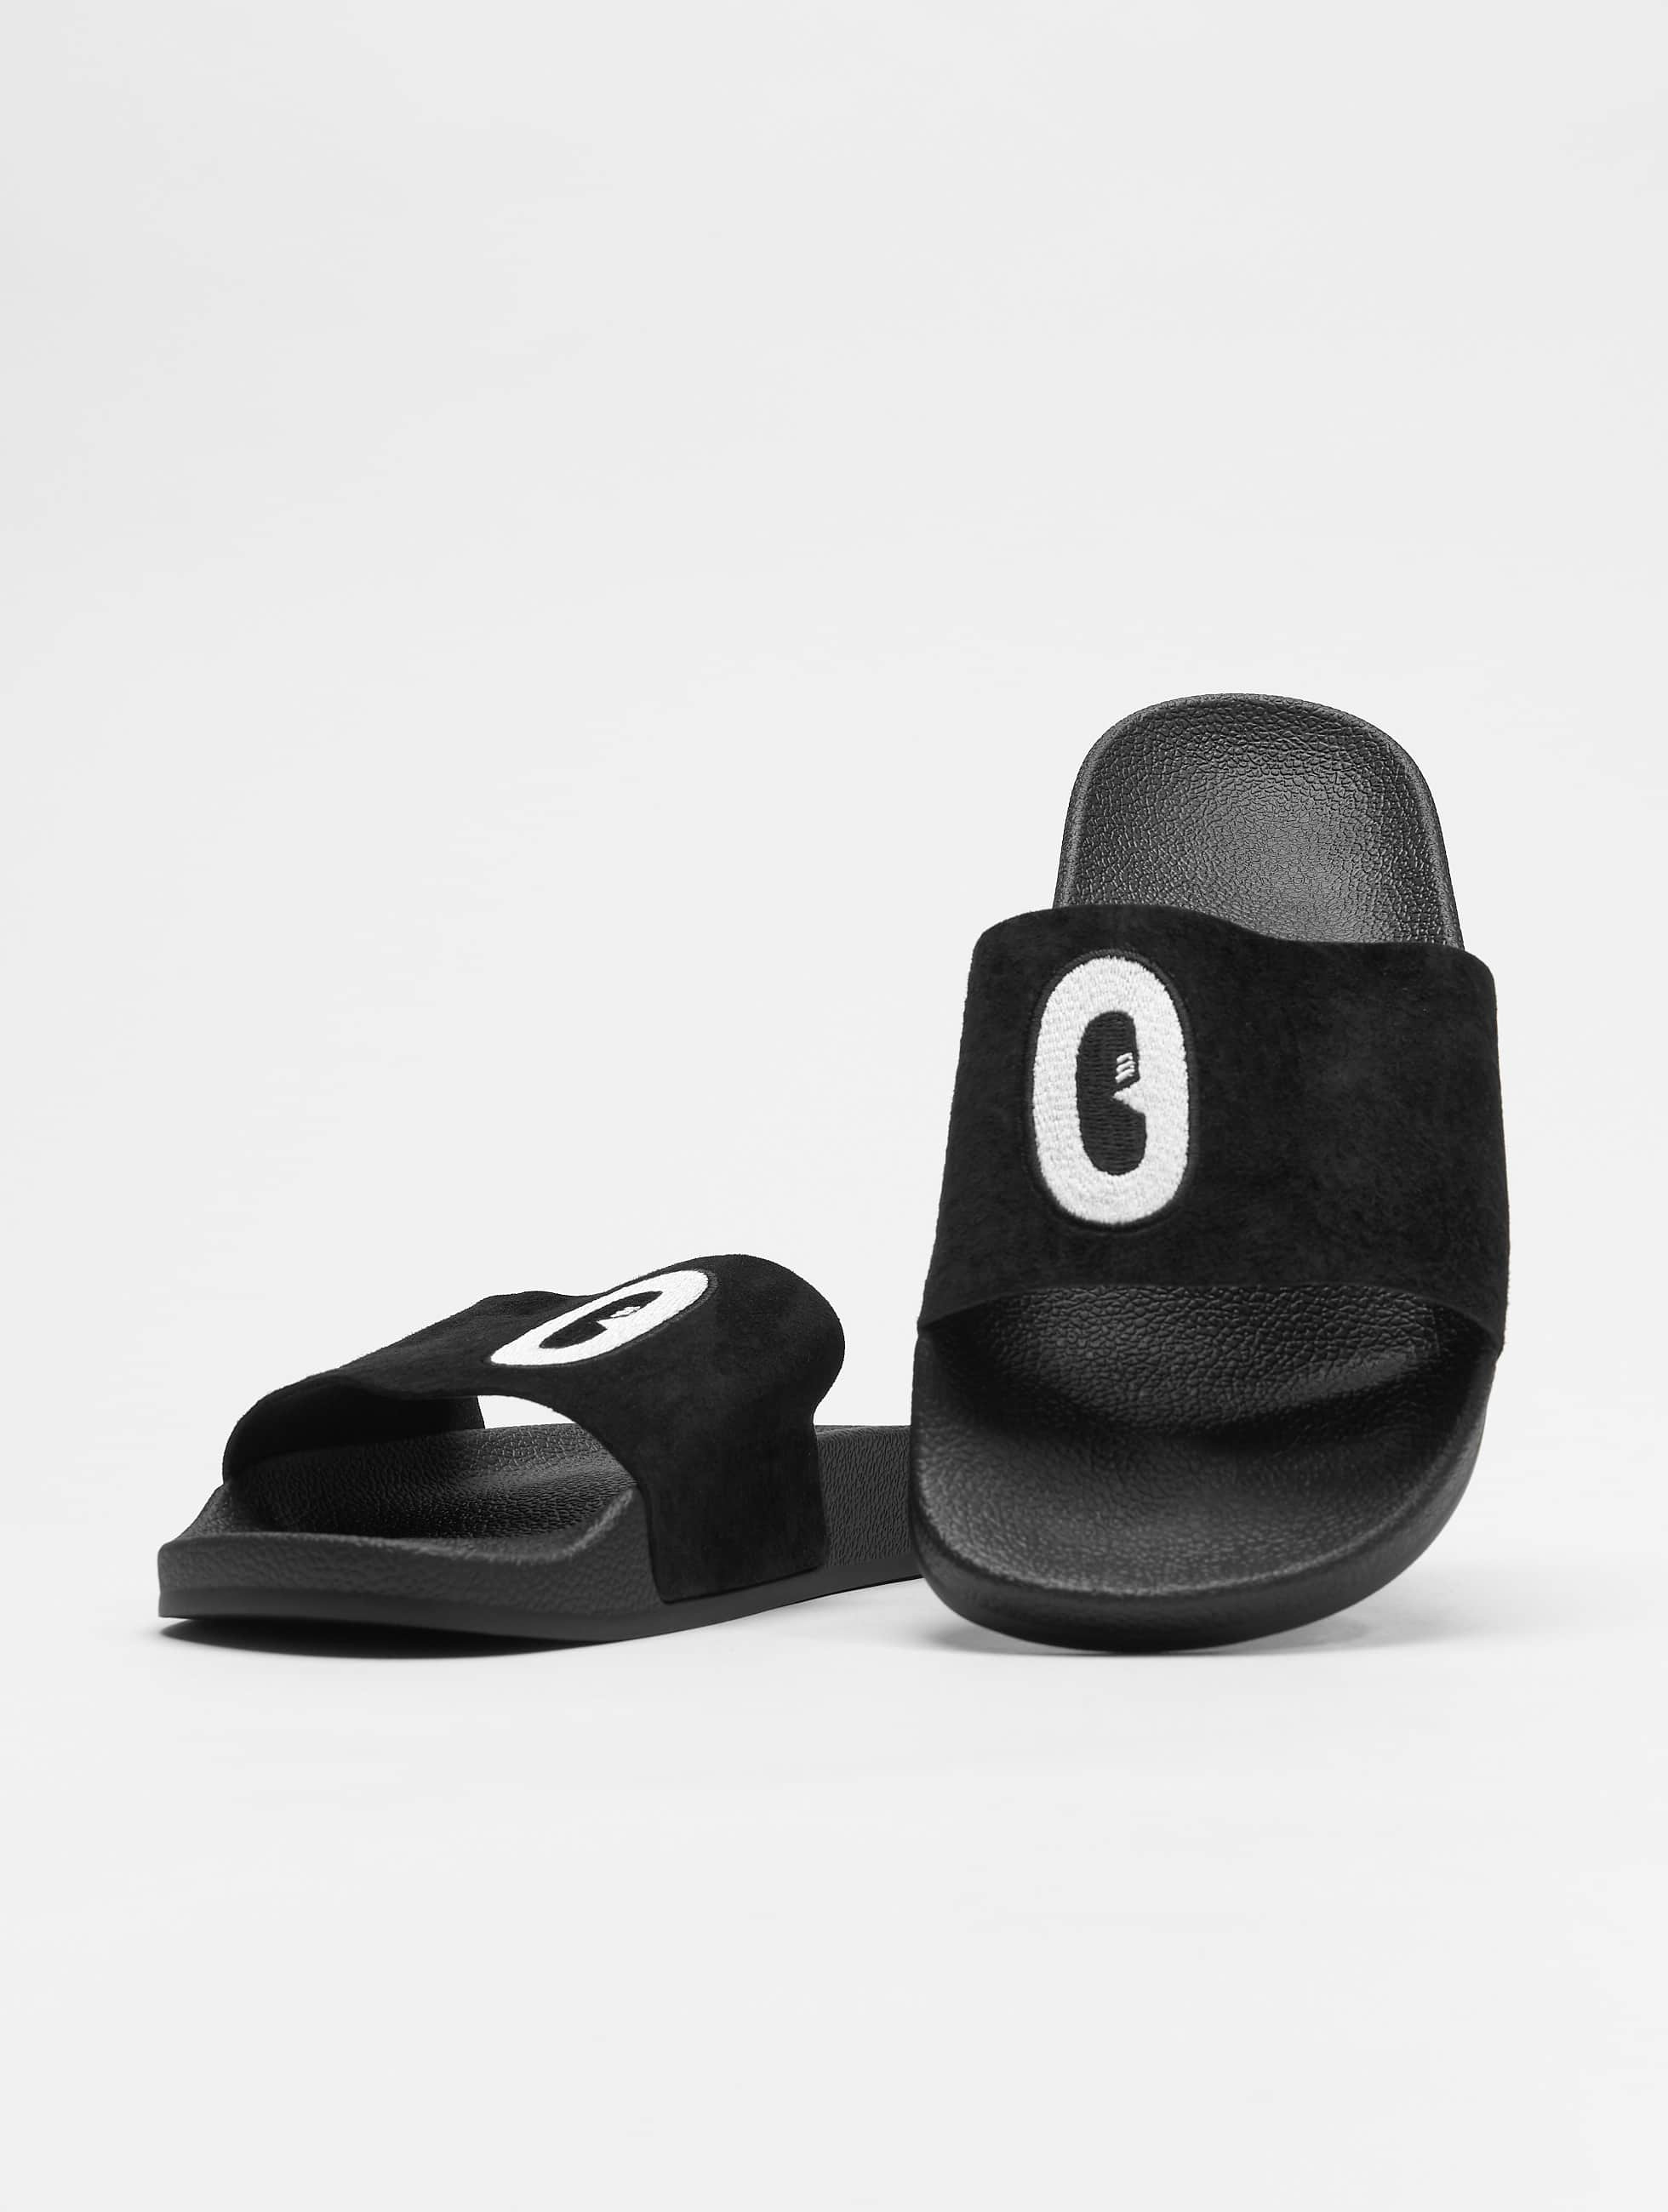 5049514848f adidas originals schoen / Slipper/Sandaal Adilette in zwart 599637